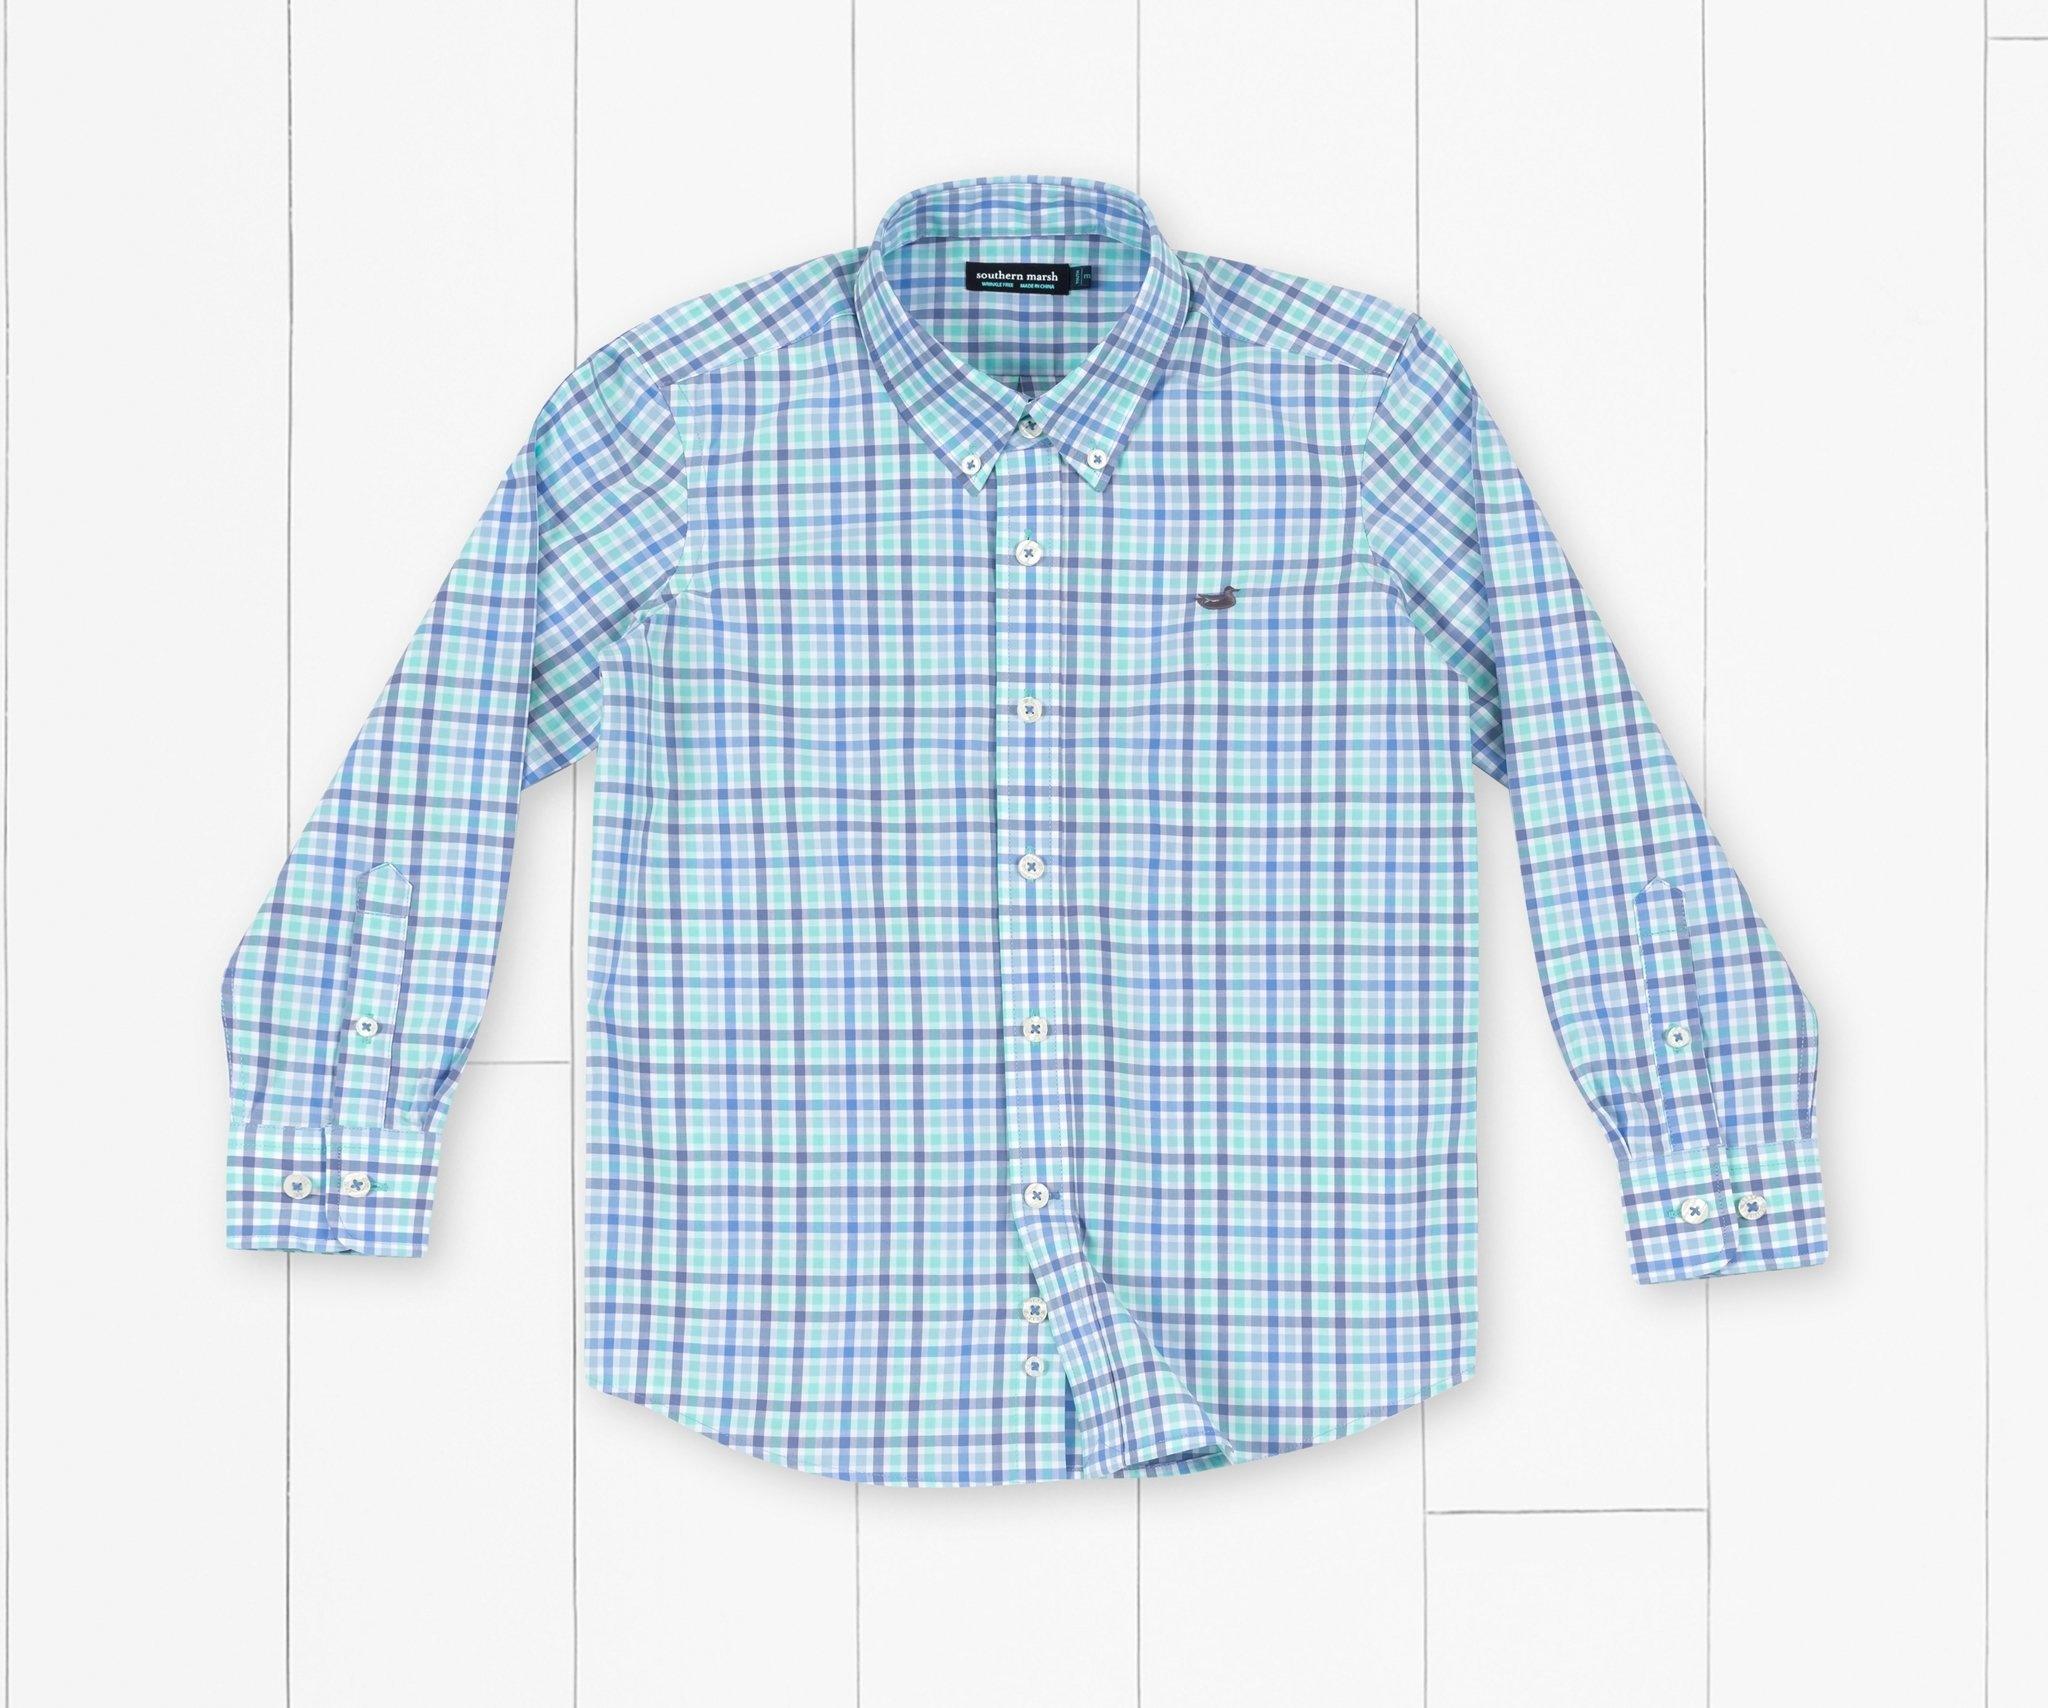 Southern Marsh Youth Juban Check Dress Shirt